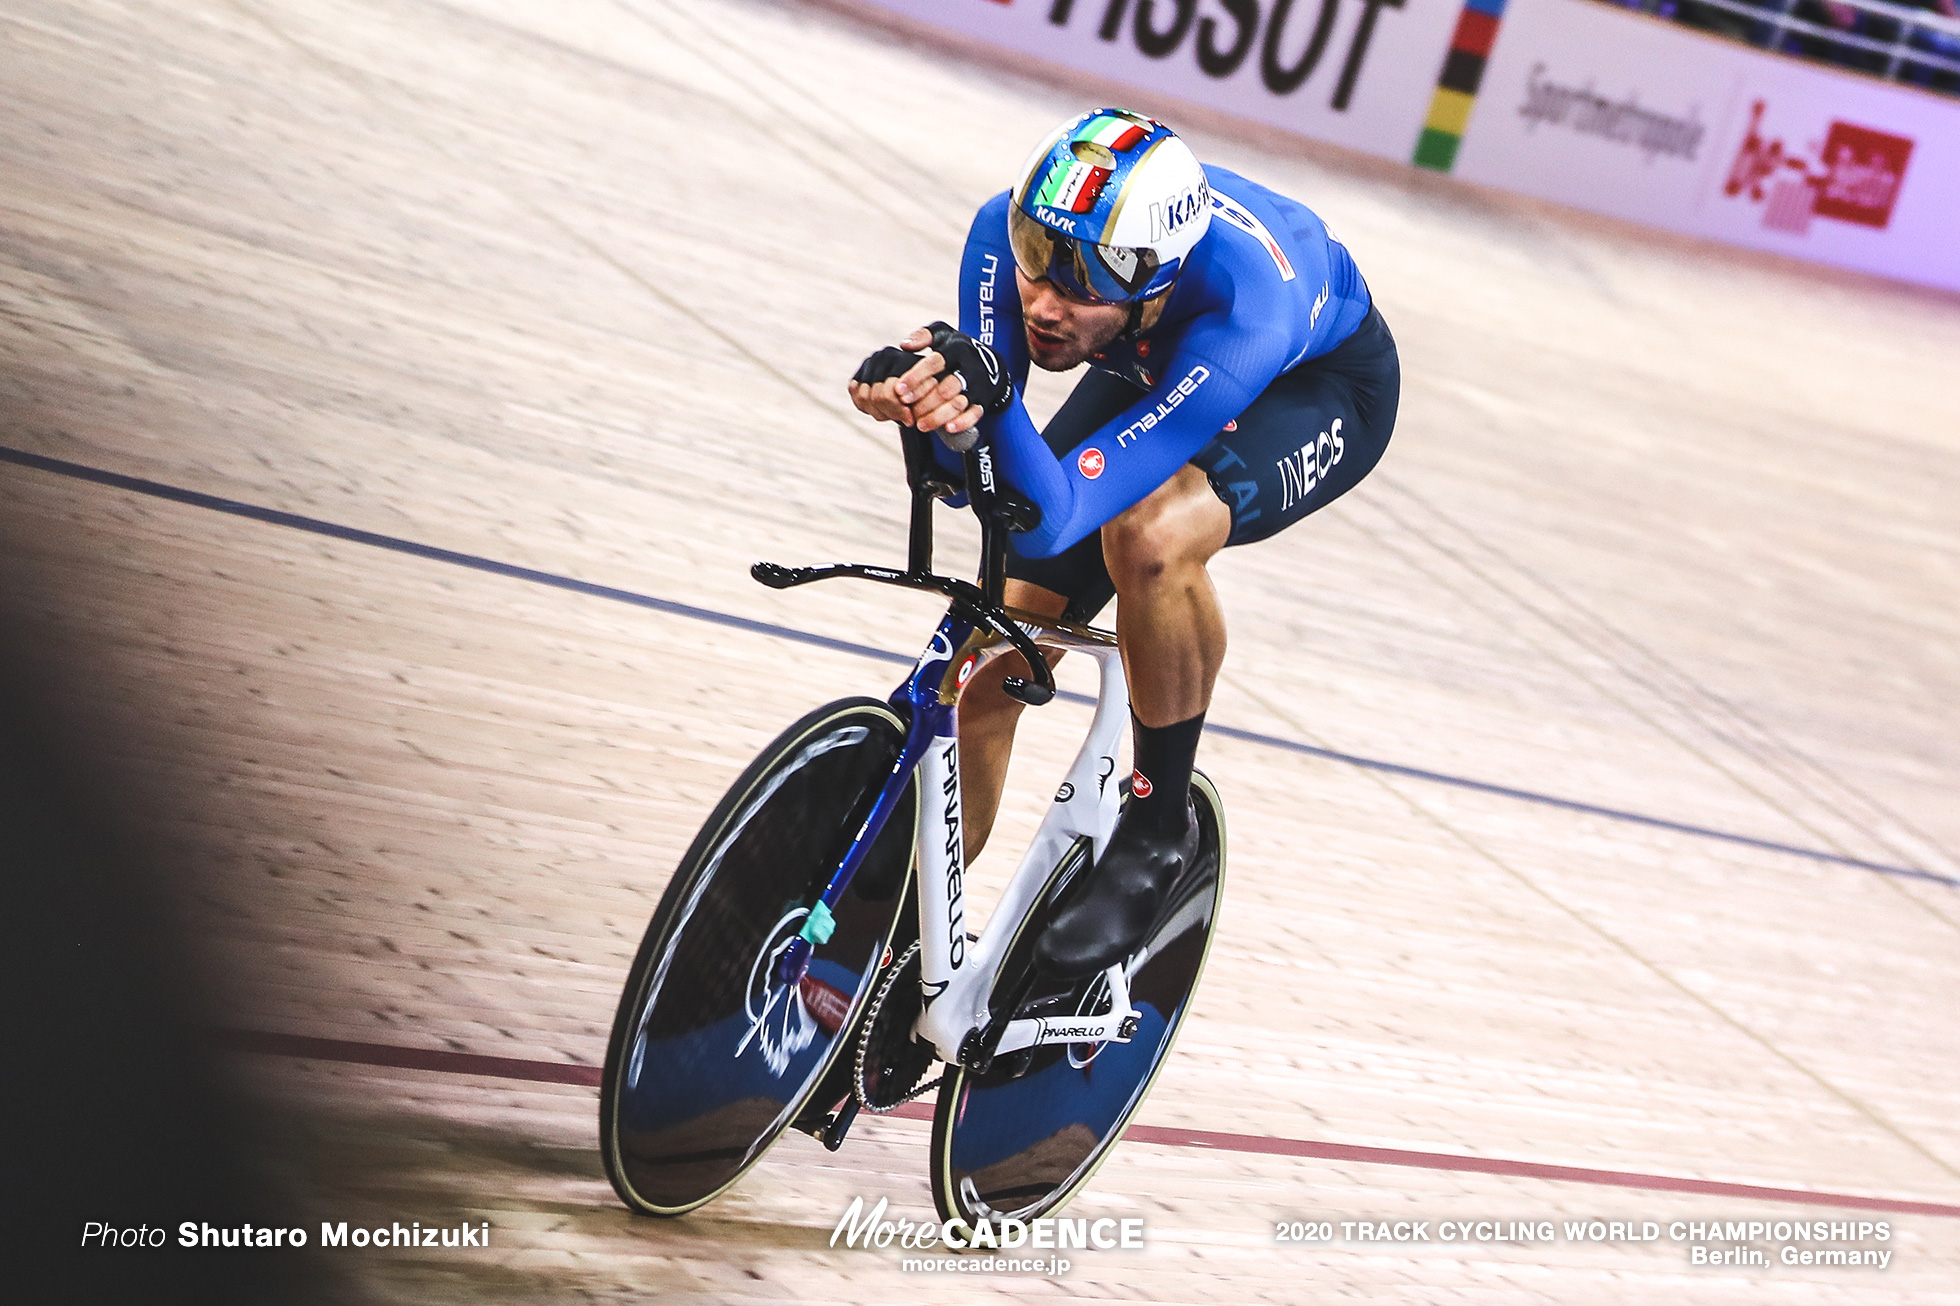 Filippo Ganna, Men's Individual Pursuit / 2020 Track Cycling World Championships, フィリポ・ガンナ